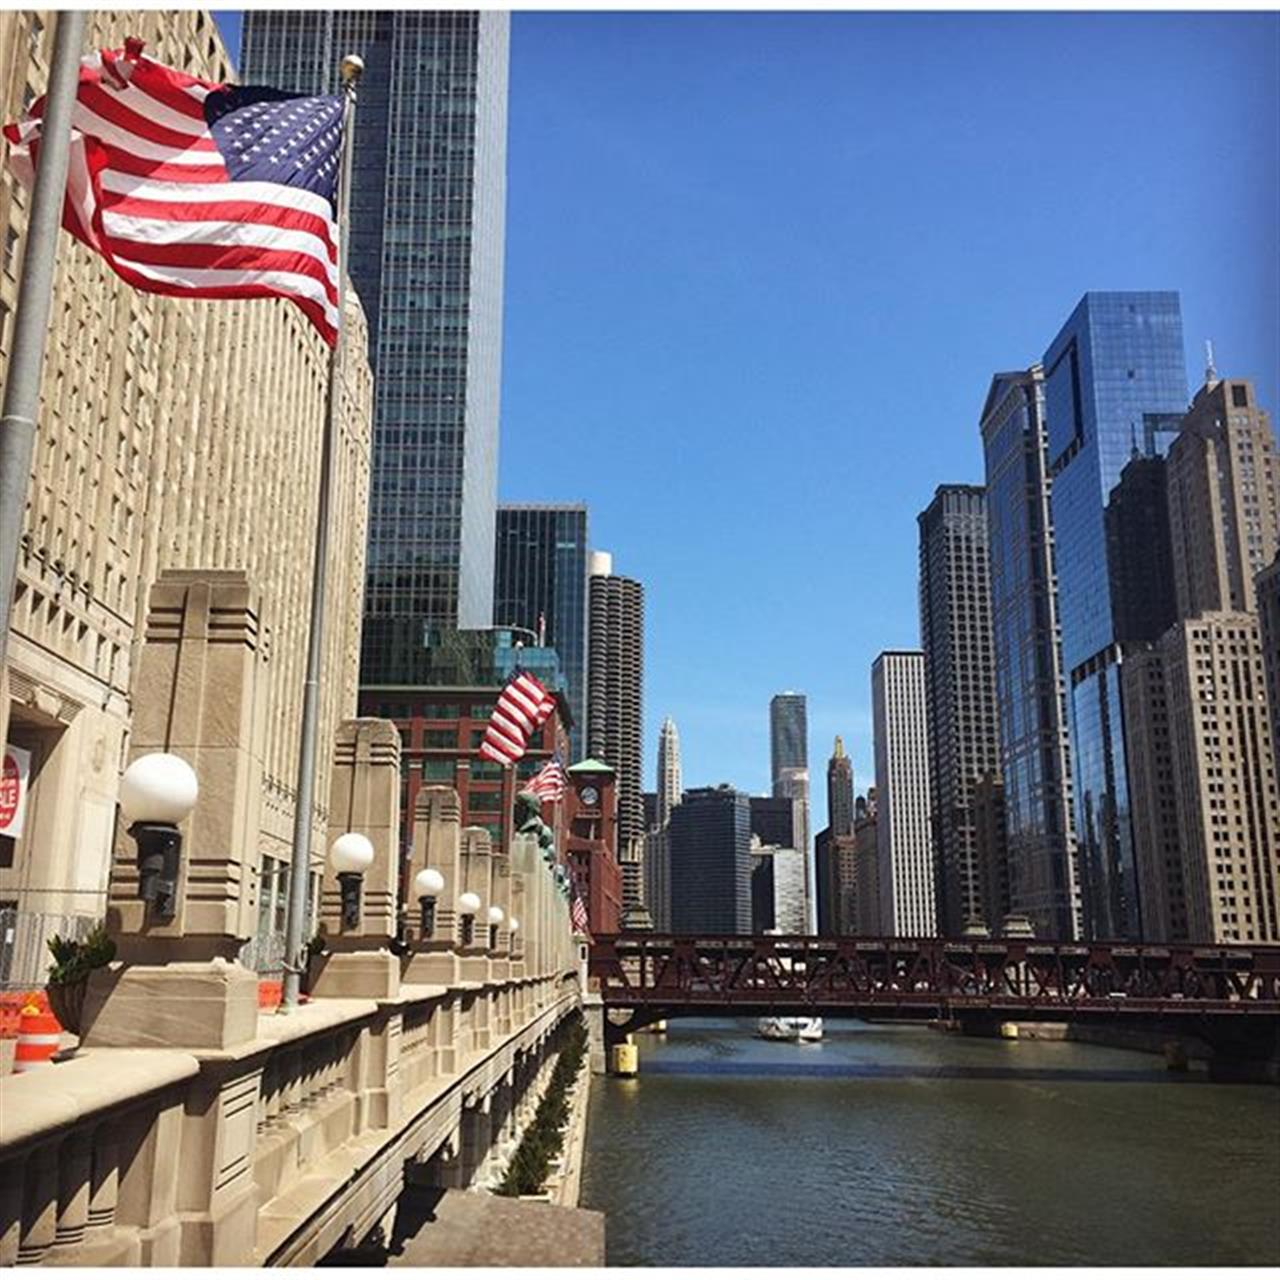 #riverwalk #chicago #summerinthecity #leadingrelocal #leadingre